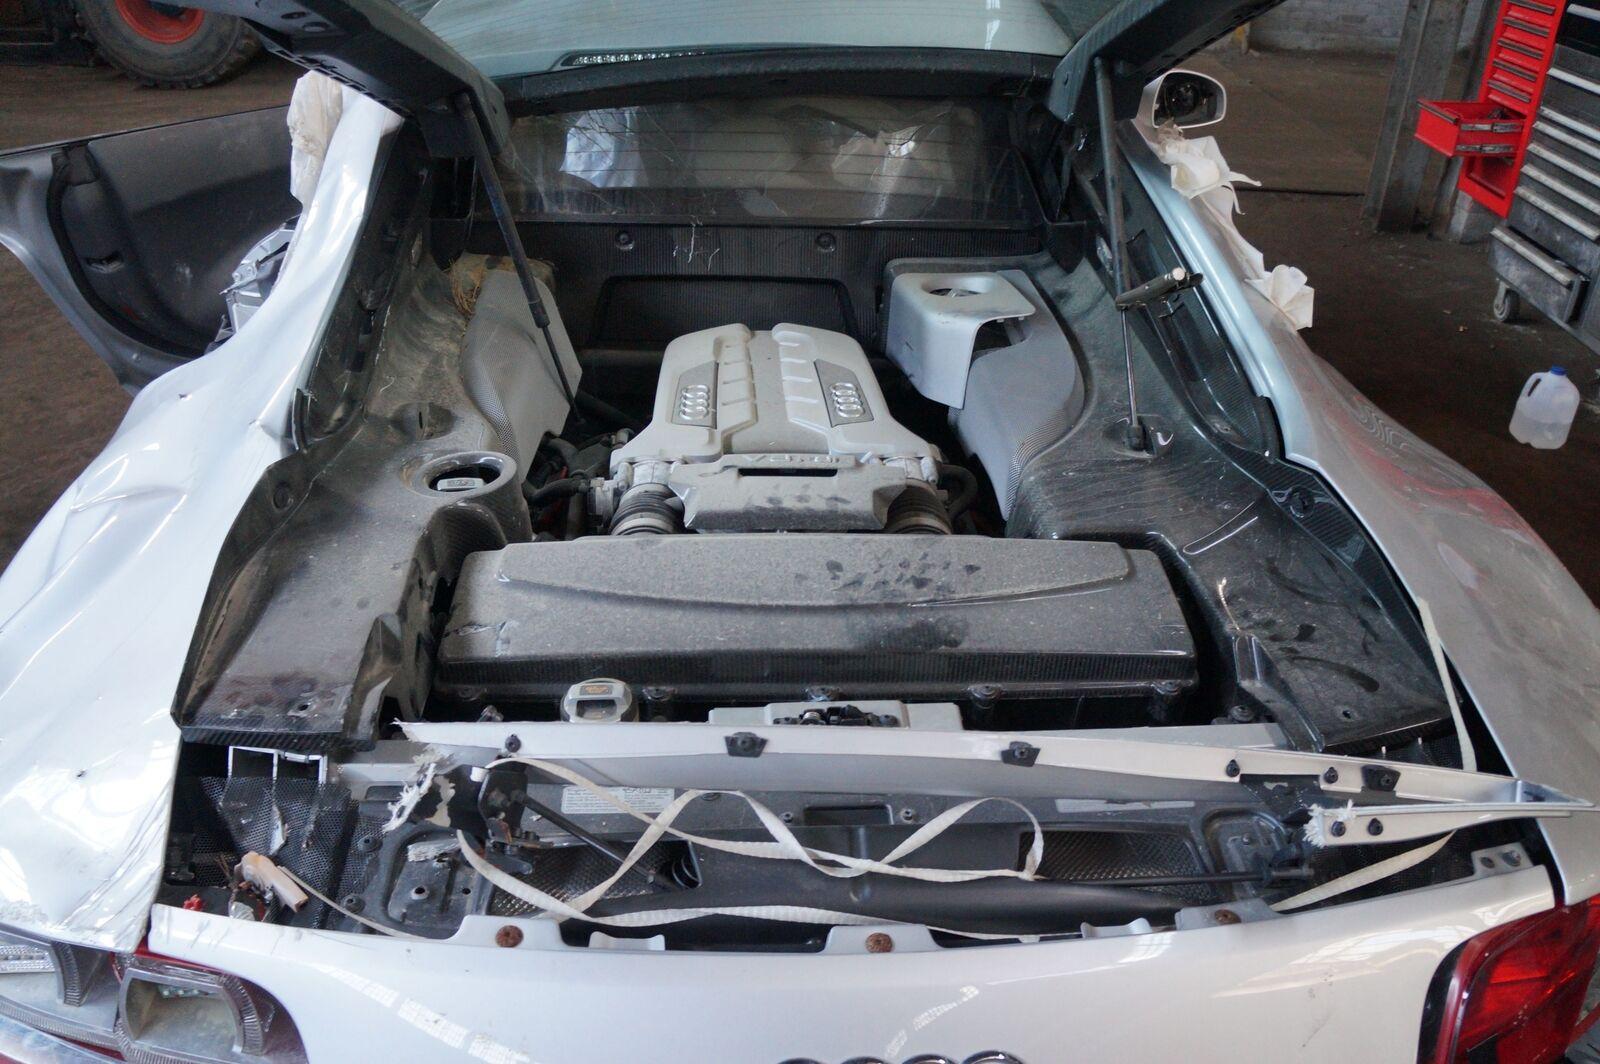 Audi R8 Fuse Box Getting Ready With Wiring Diagram Bmw V1 0 Engine Schematic Rh 25 Yehonalatapes De 2009 I8